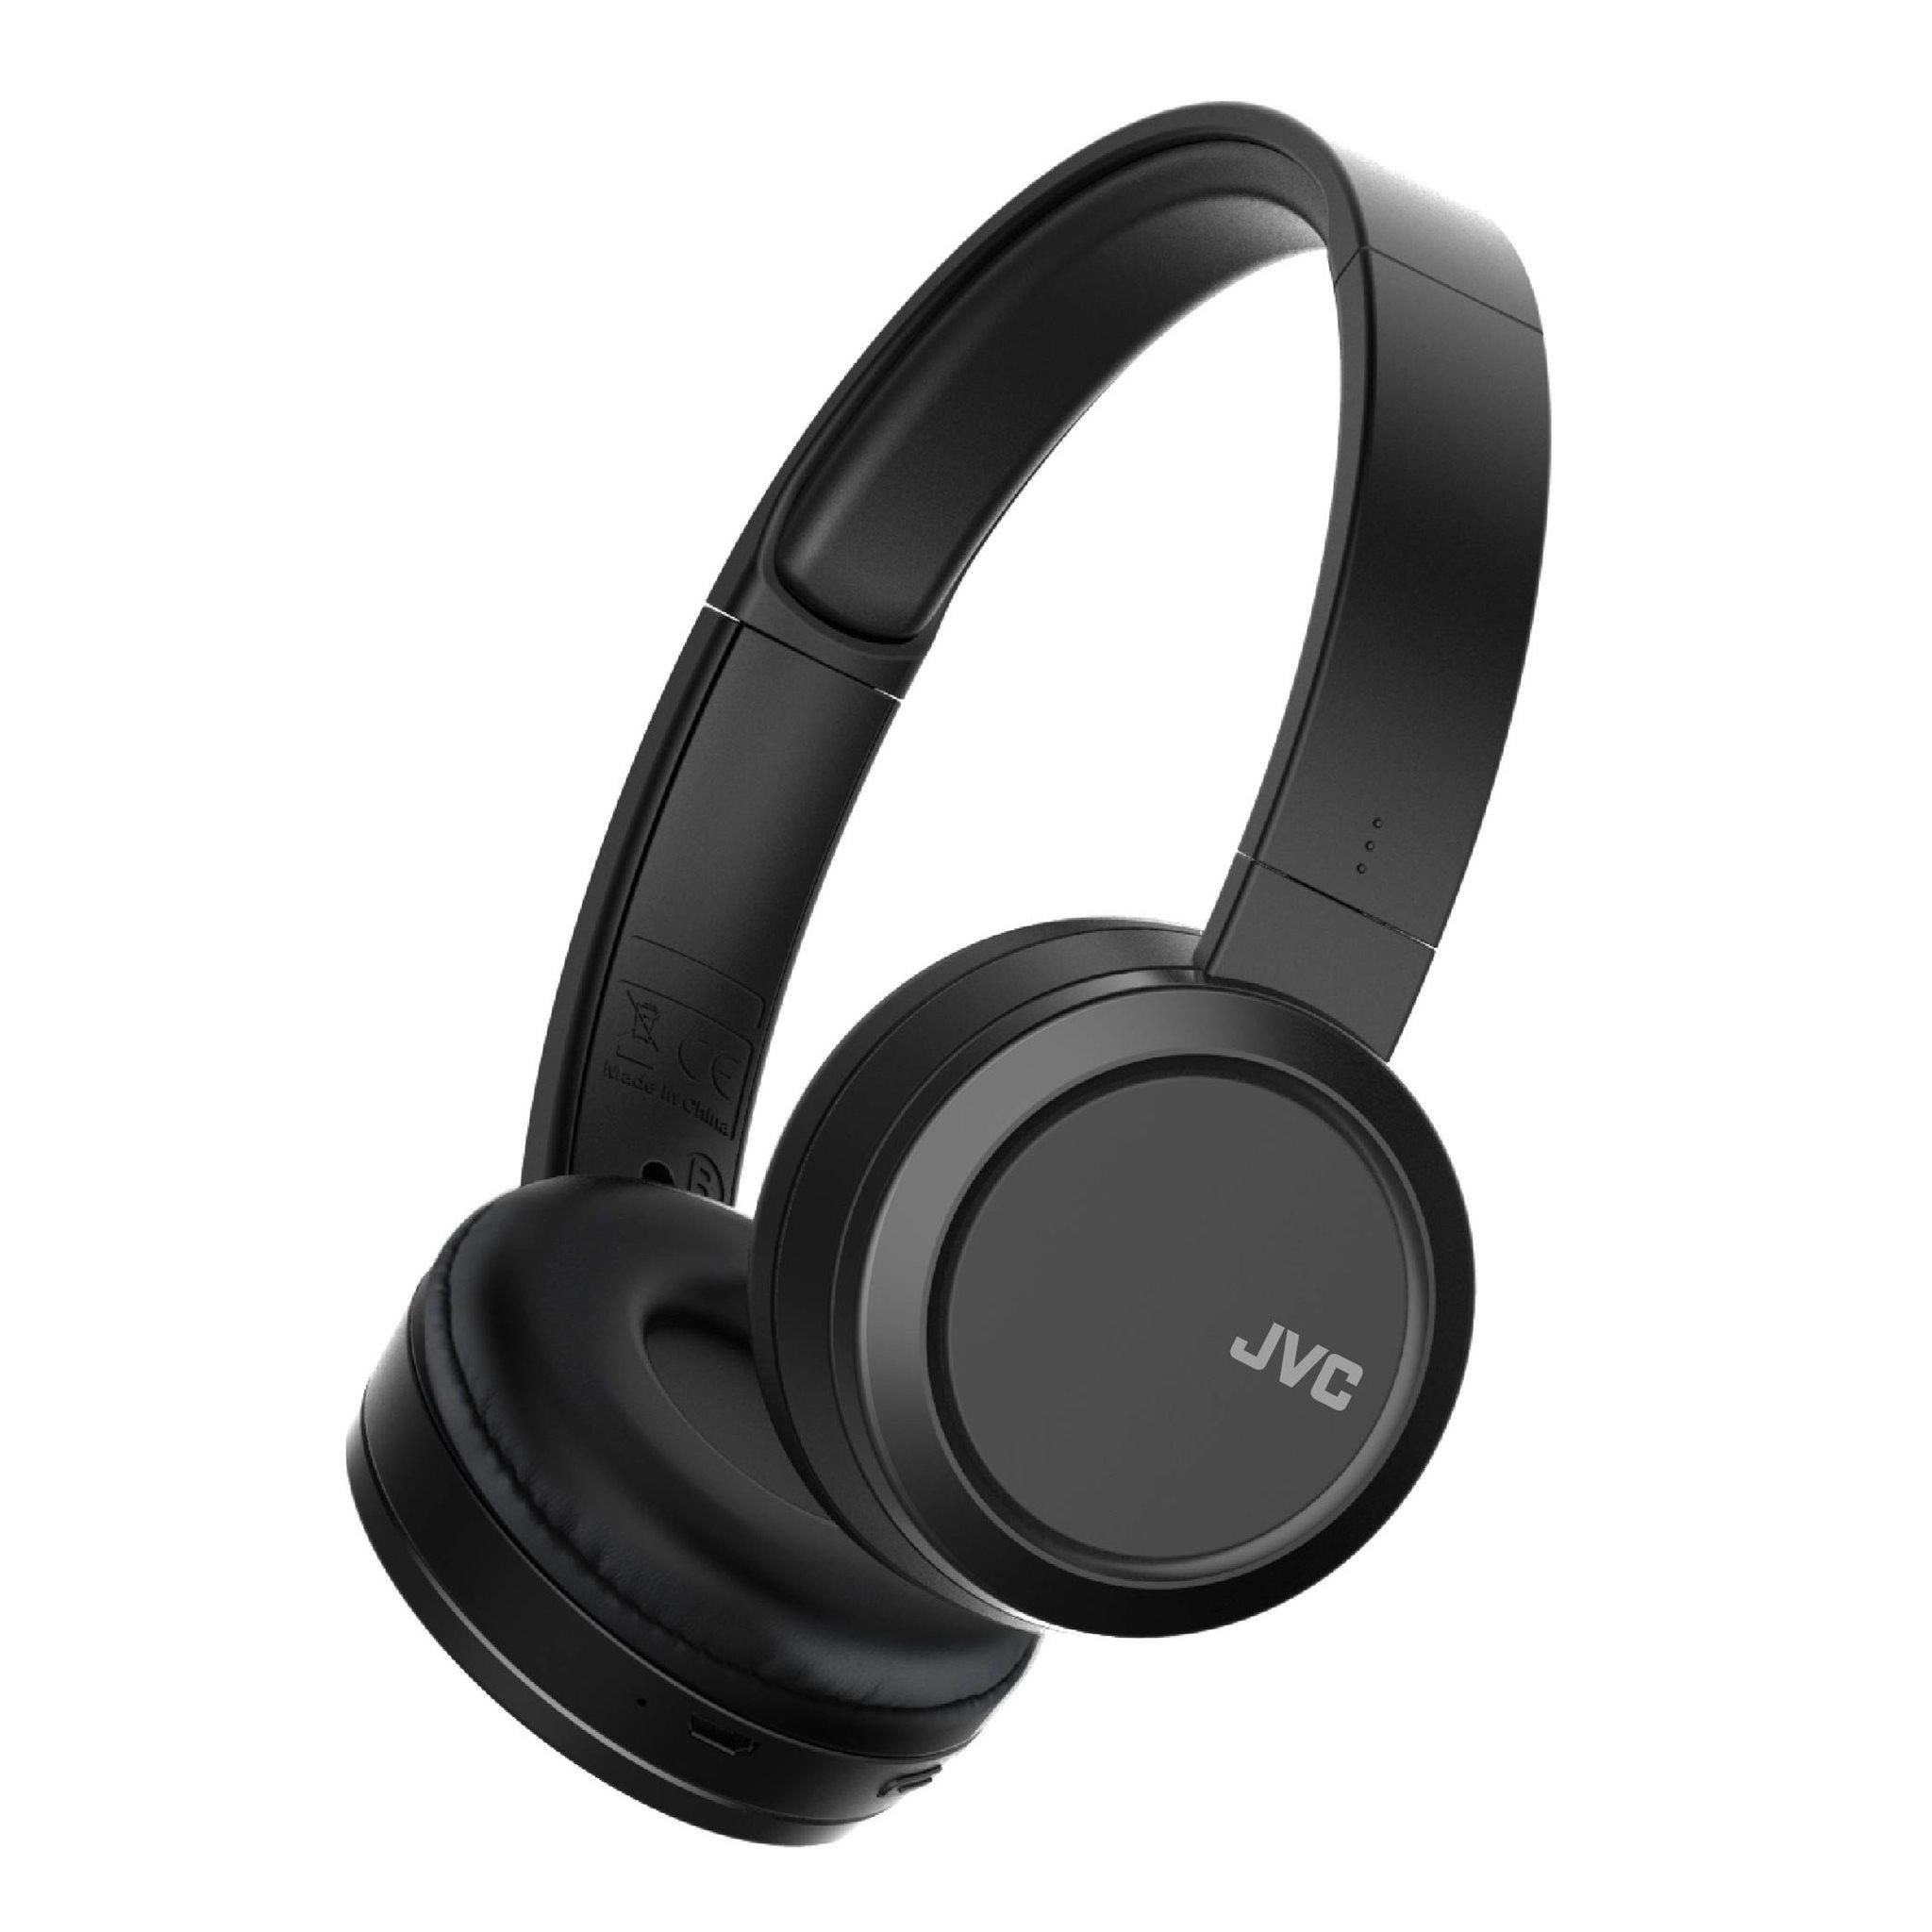 JVC Hörlur S50 On-Ear Trådlös M.. (333758060) ᐈ digitalwarehouse på ... 8e0477af1f5d5